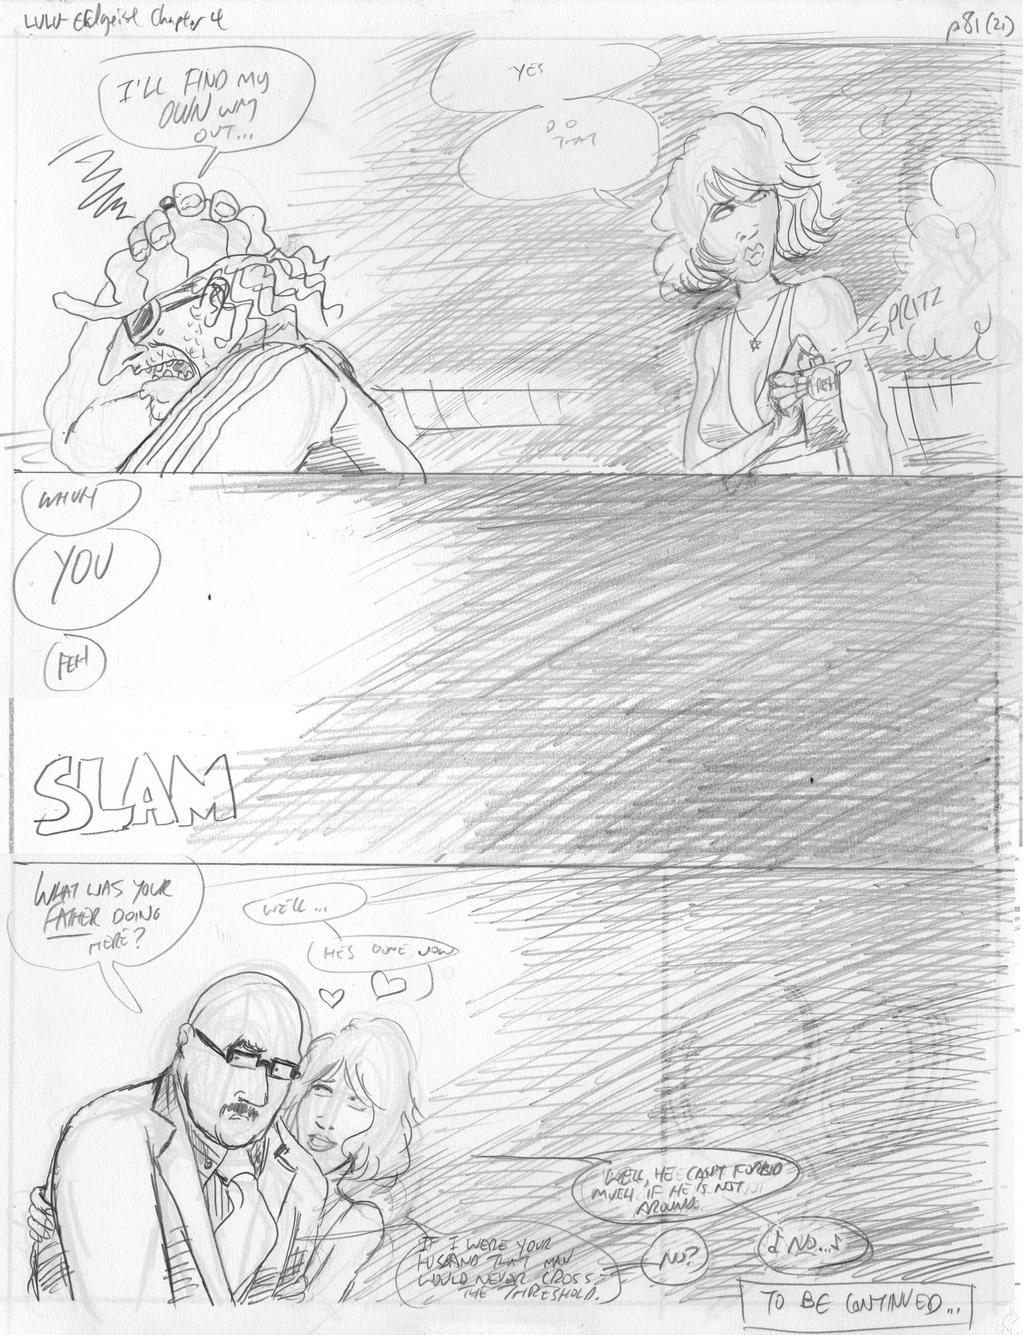 LULU Book 2 - Chapter 4 p. 82 Pencil by JLRoberson